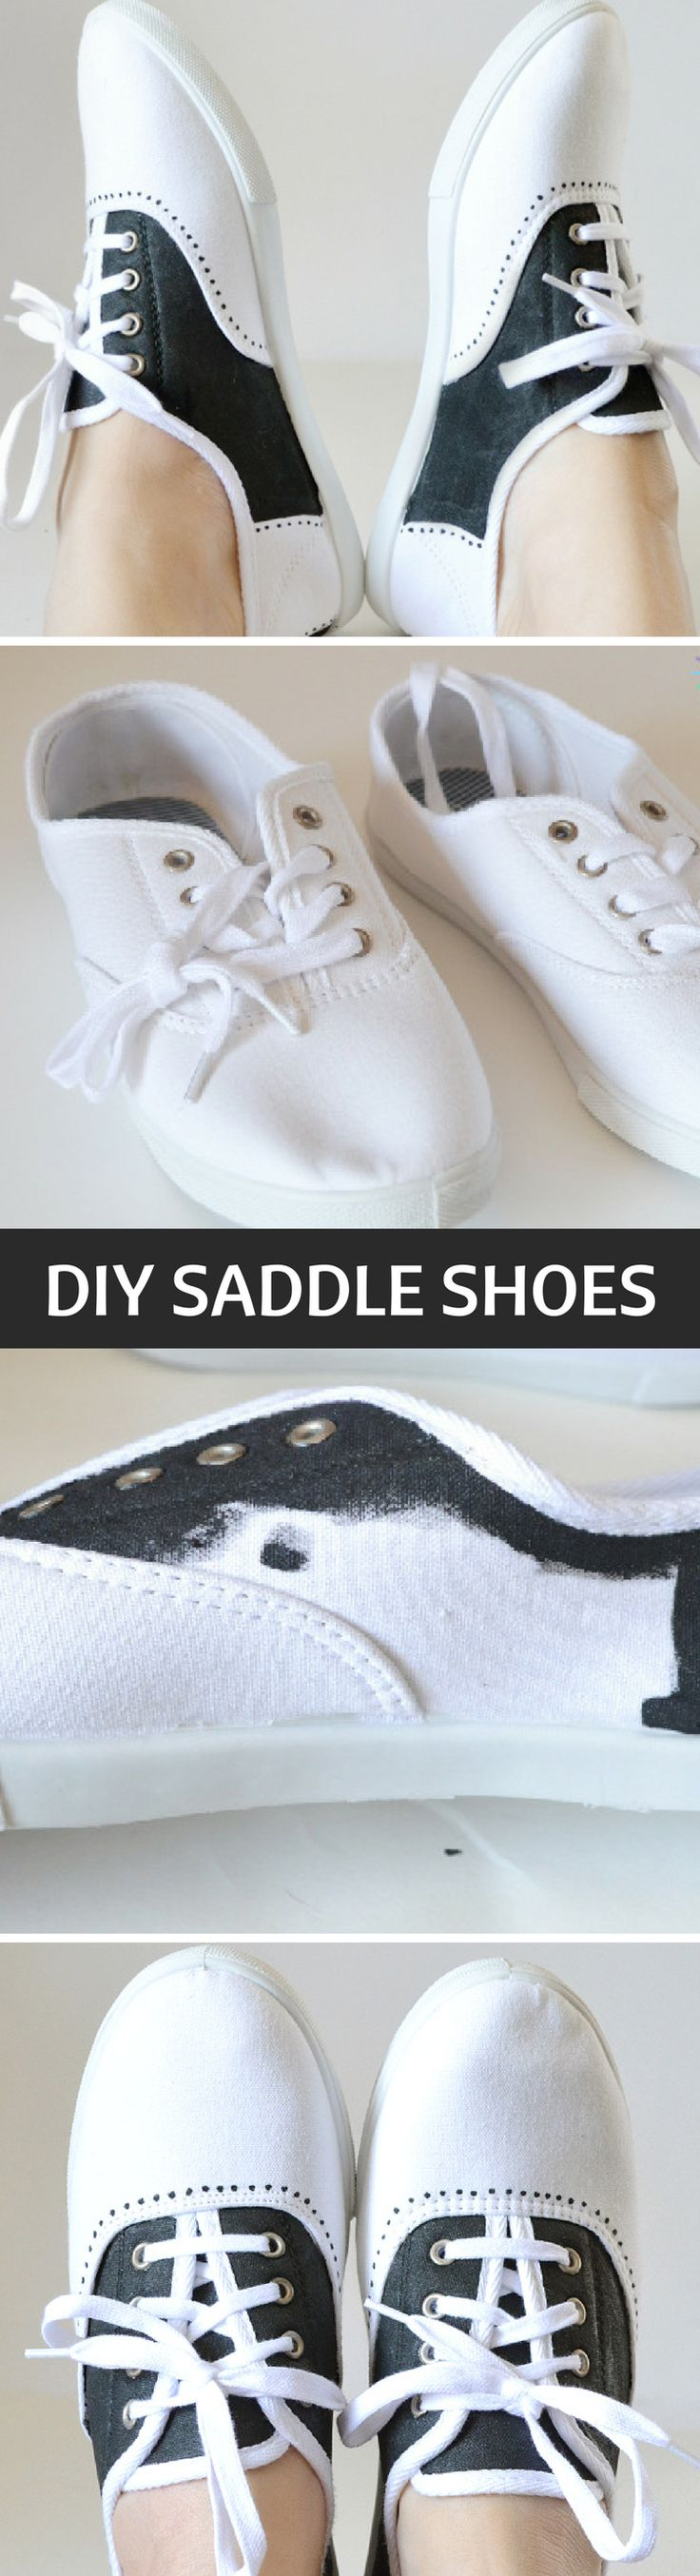 Shoe Makover: Painted Faux Saddle Shoes Tutorial